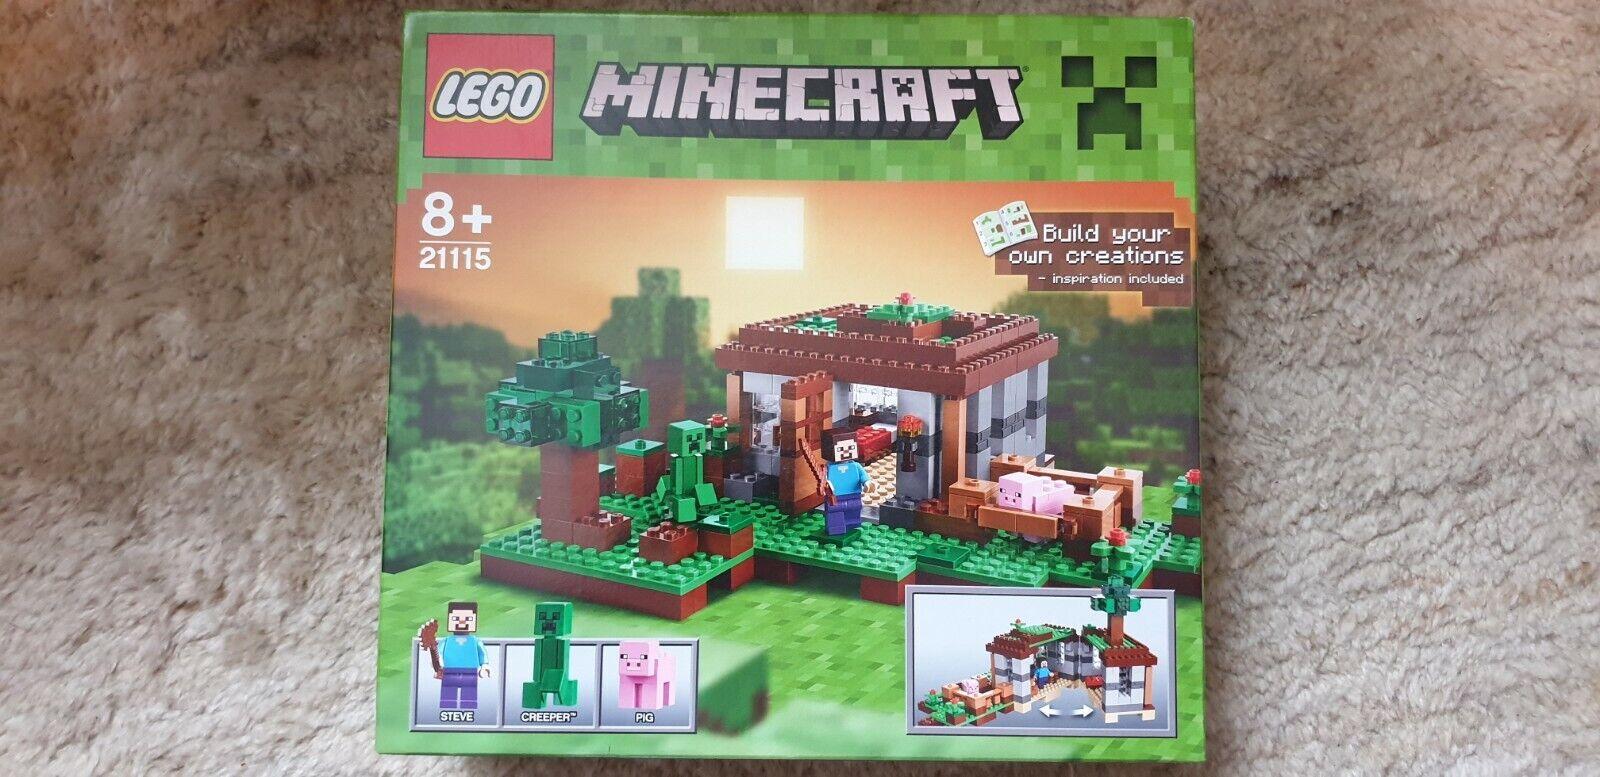 Neu & ovp LEGO Minecraft 21115 Seves Haus Creeper Pig Mojang TOPP